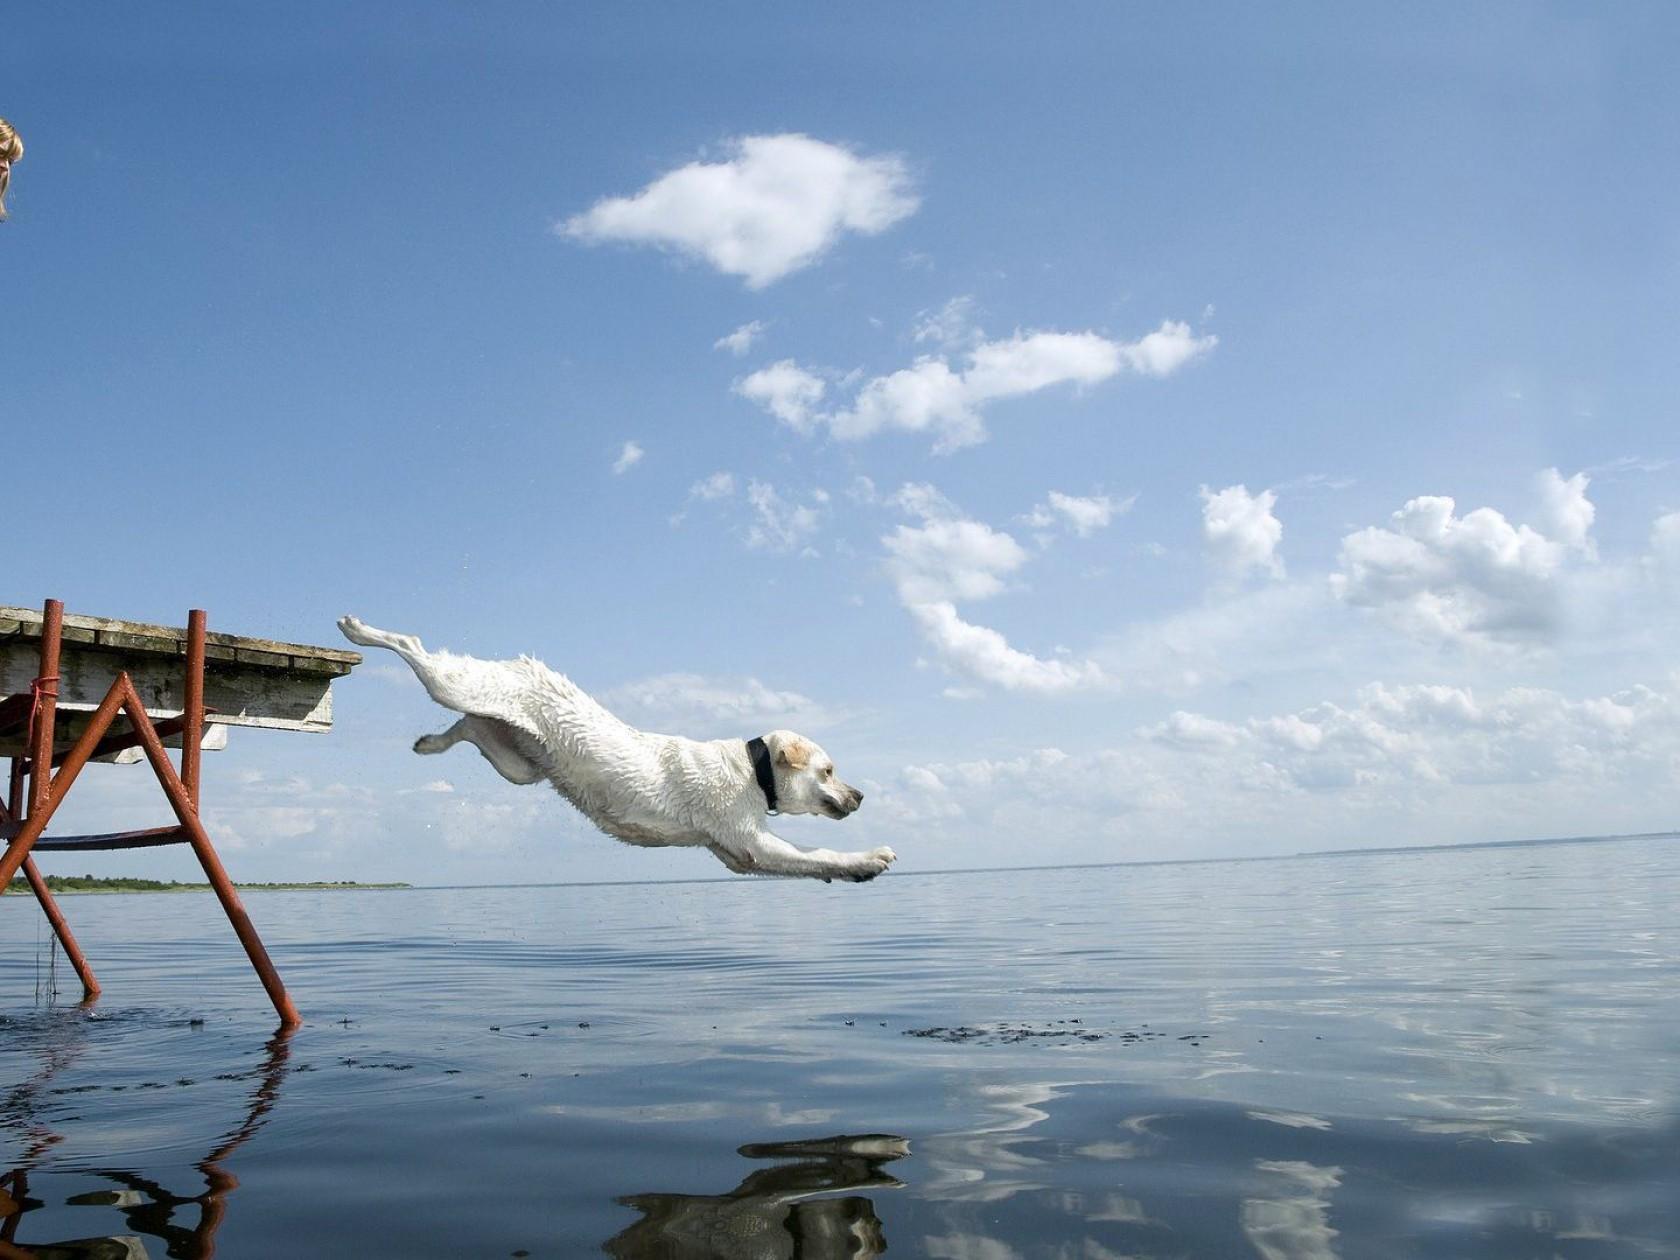 Girl-dog-sea-diving-swimming-1260x1680